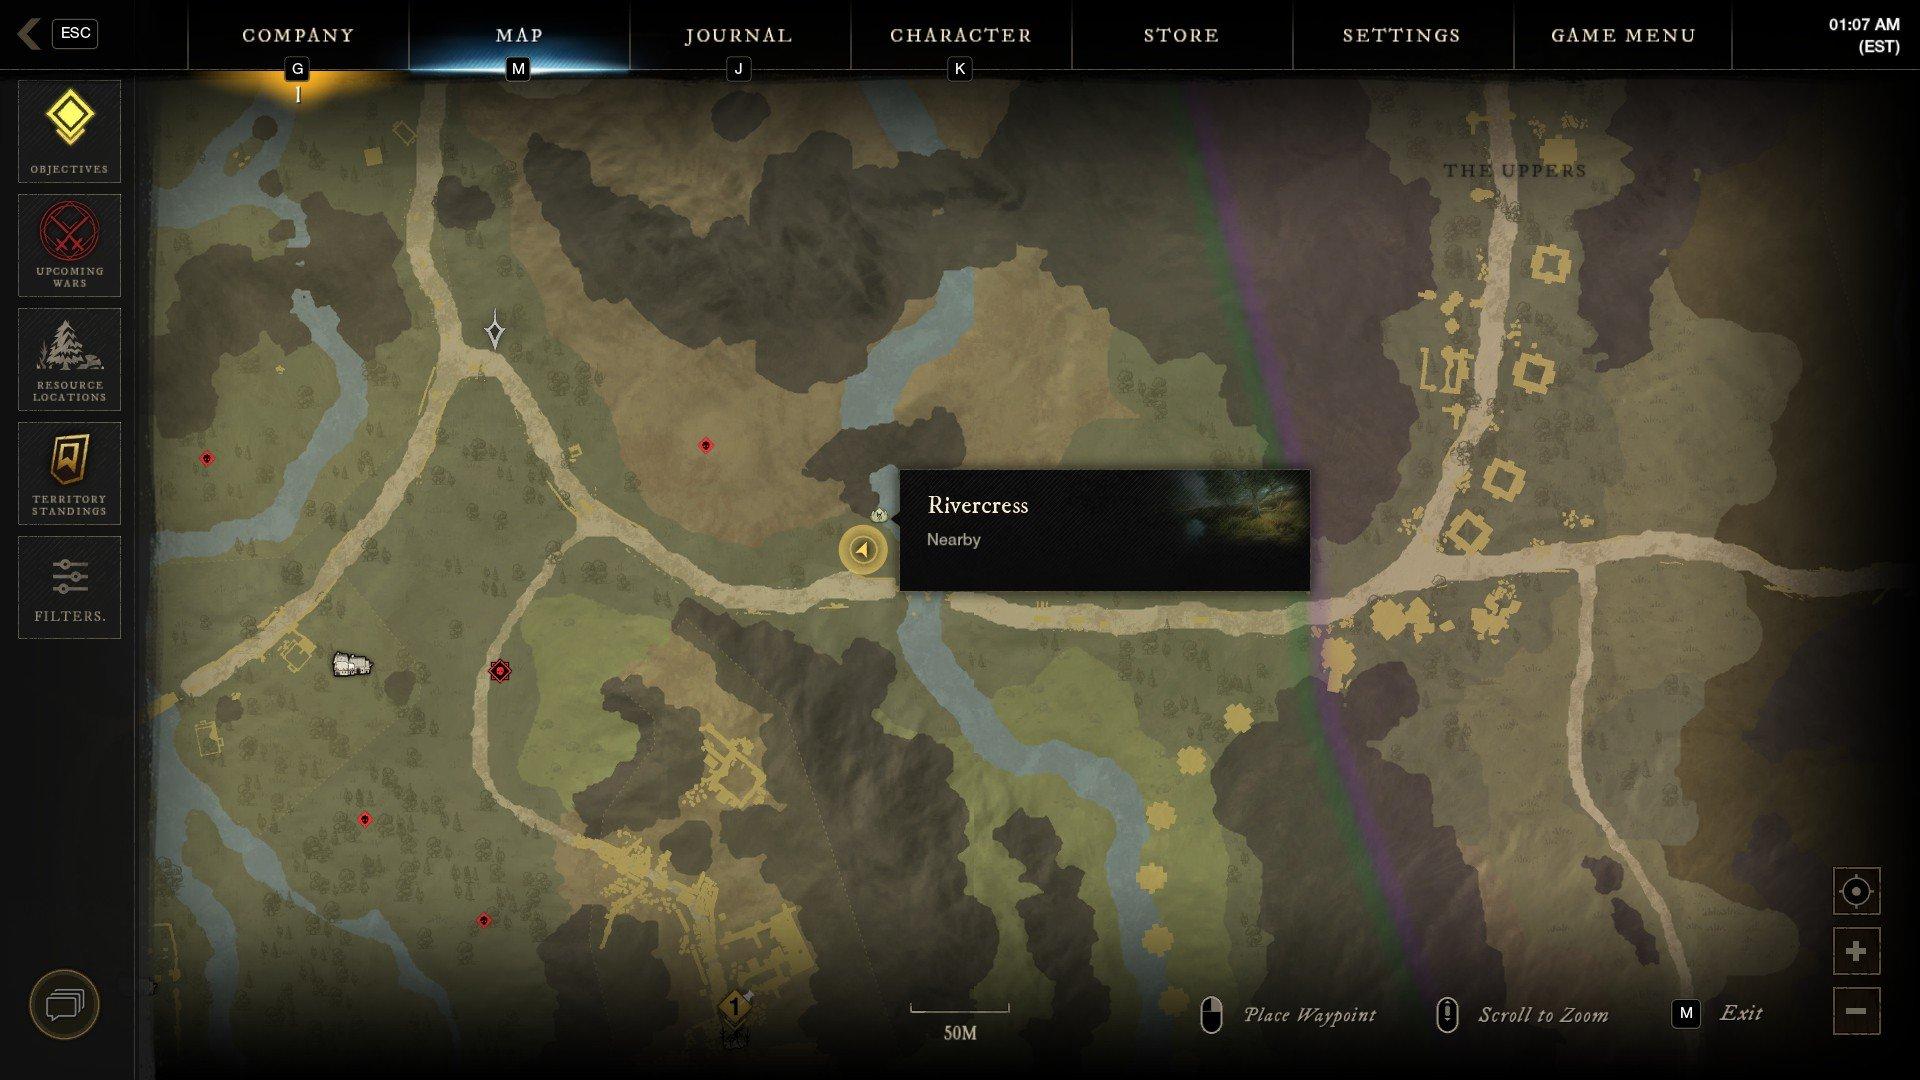 New World - Rivercress Map Biome Tracking